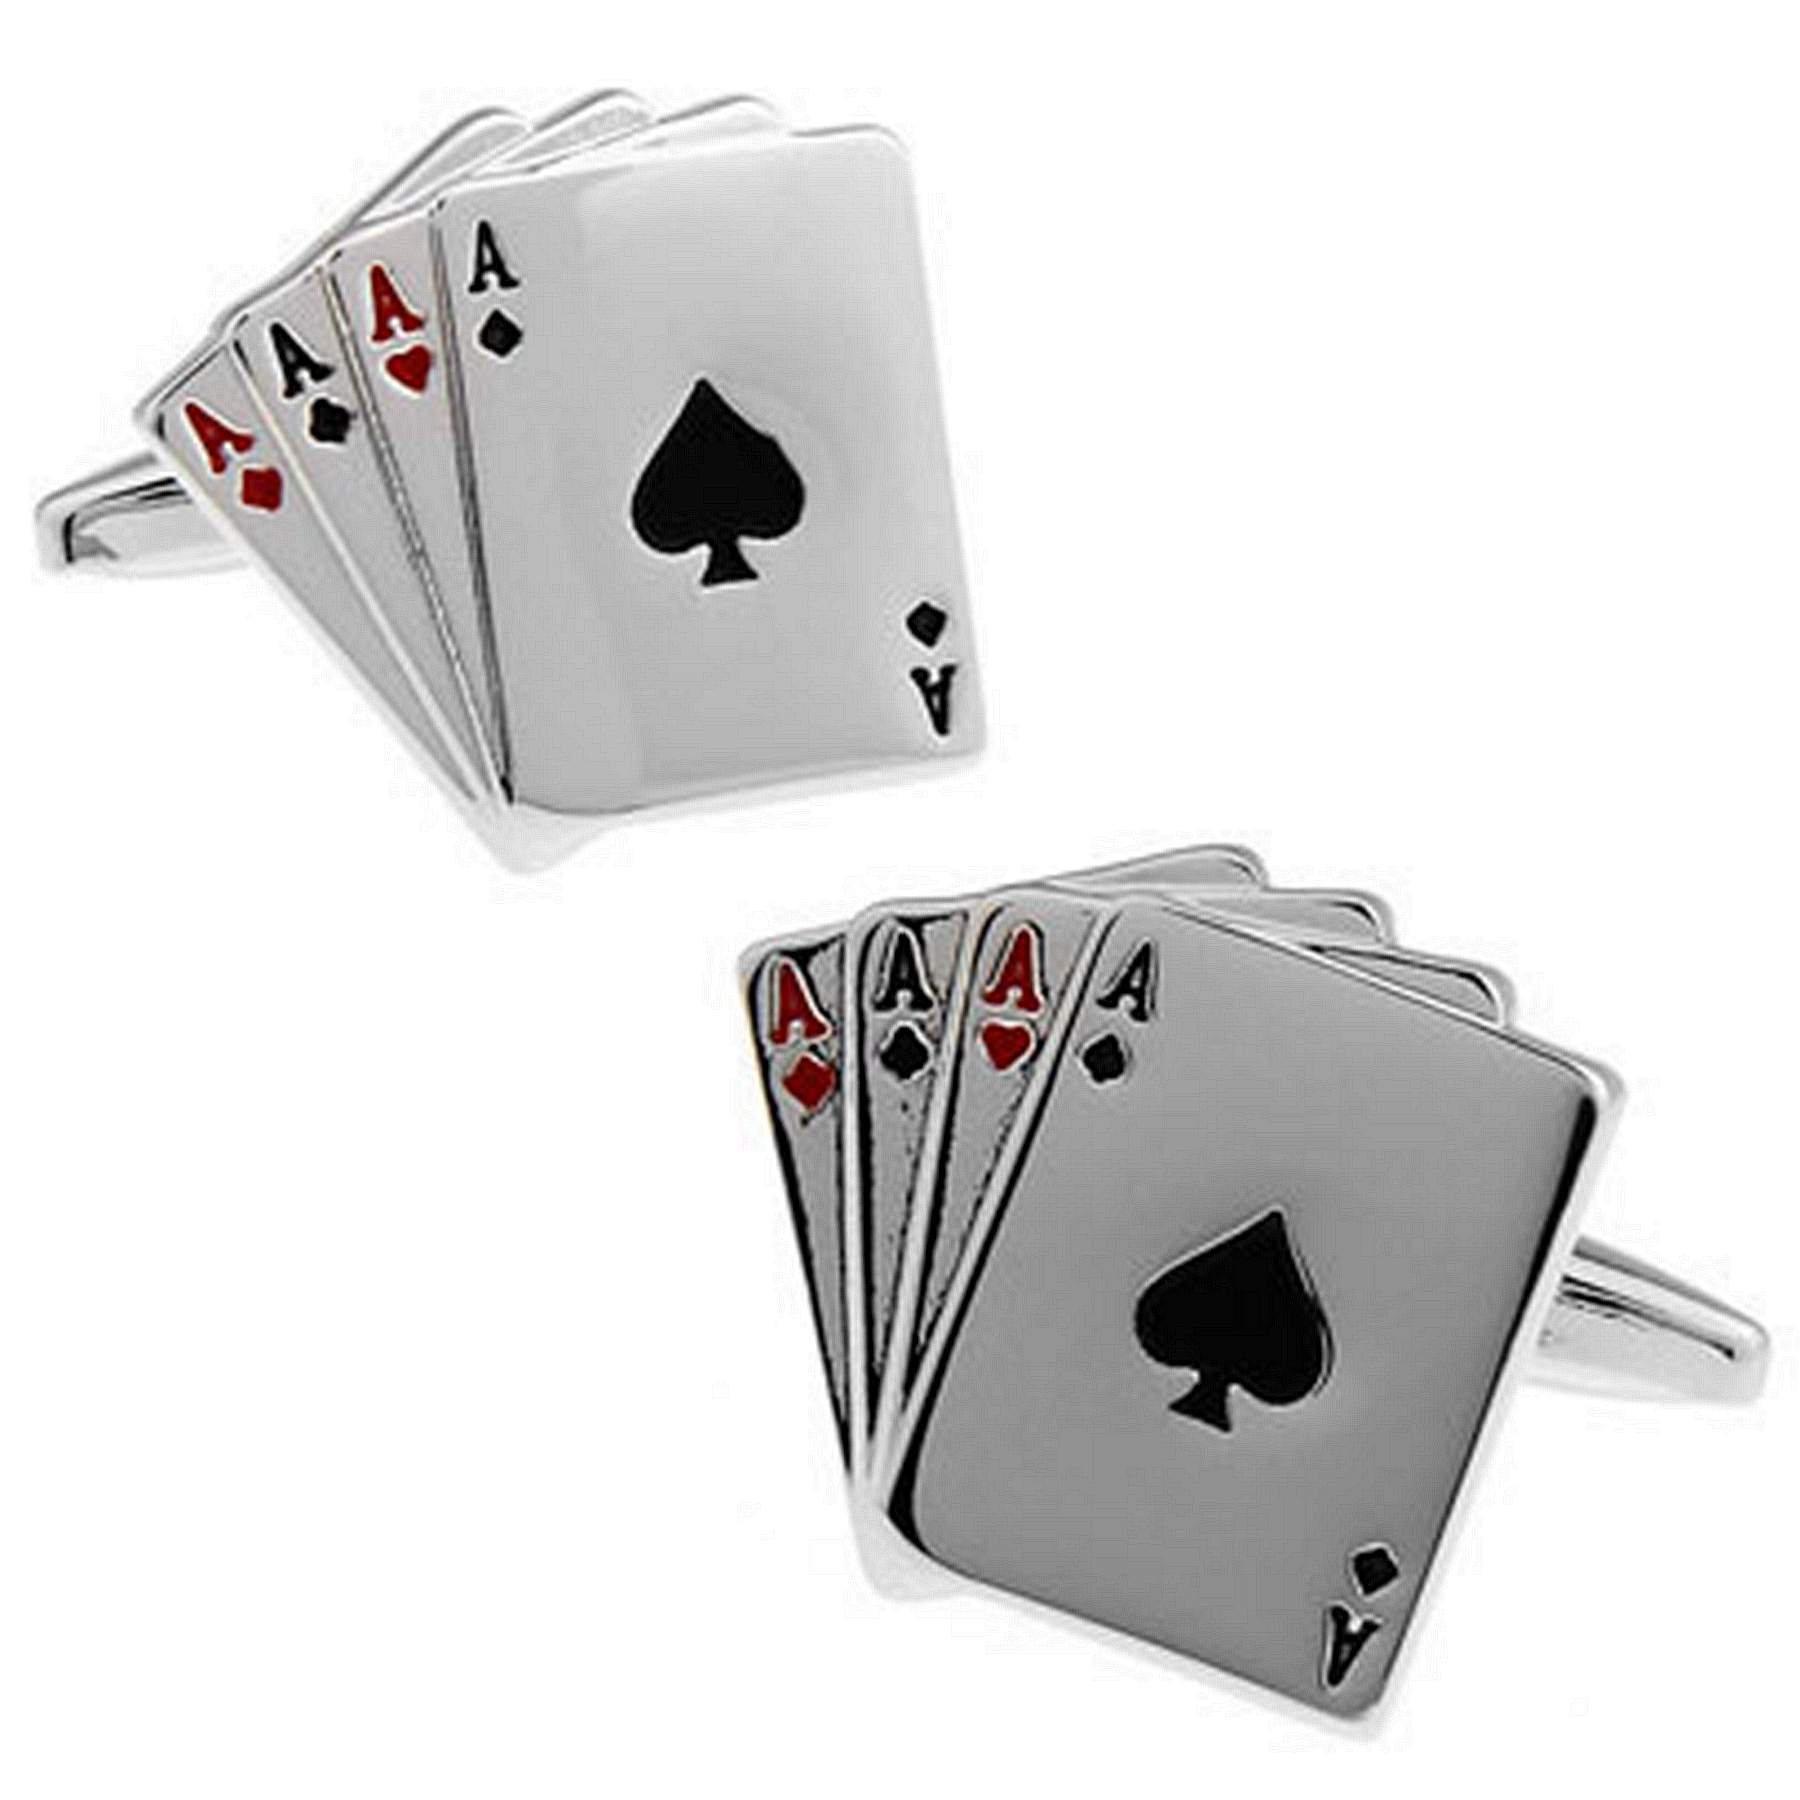 RXBC2011 Men's Poker Style French Shirts Cufflinks 1 Pair Set